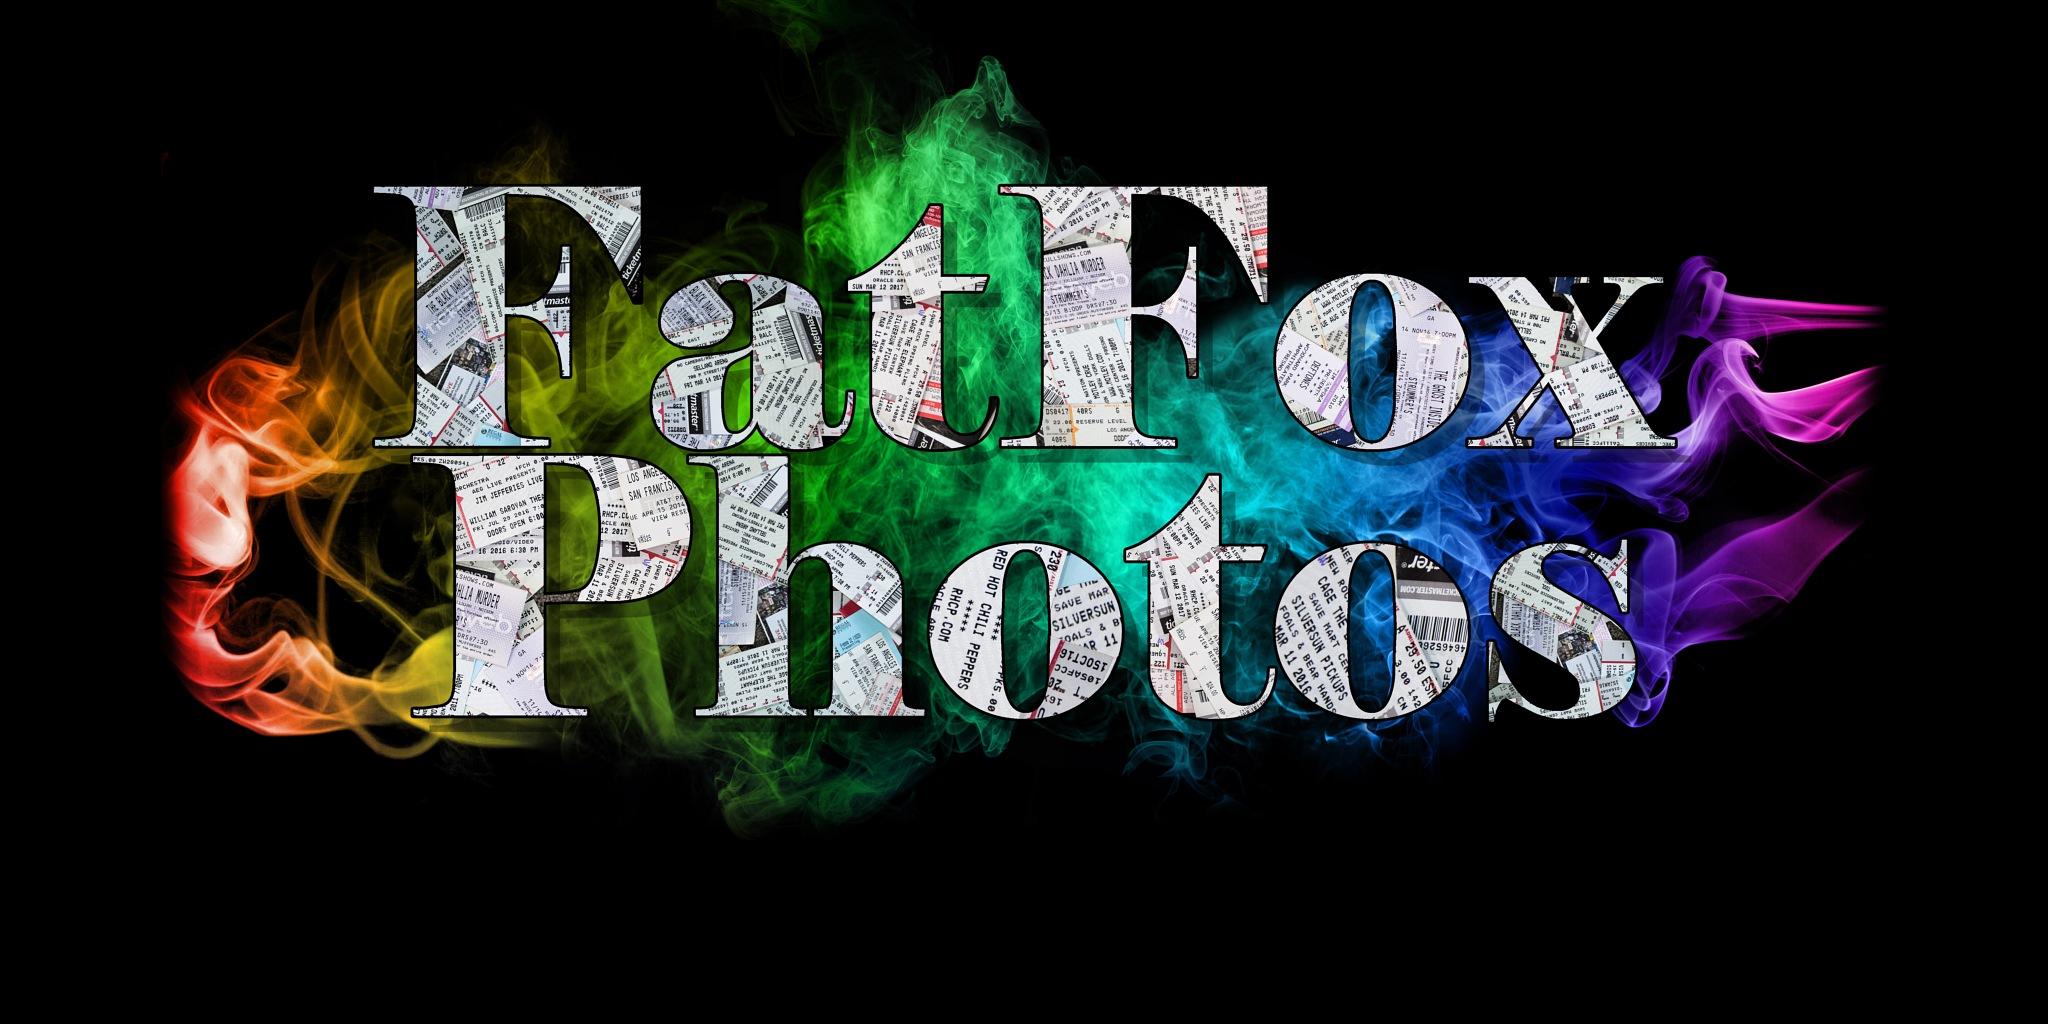 FatFox by Joshua Martinez